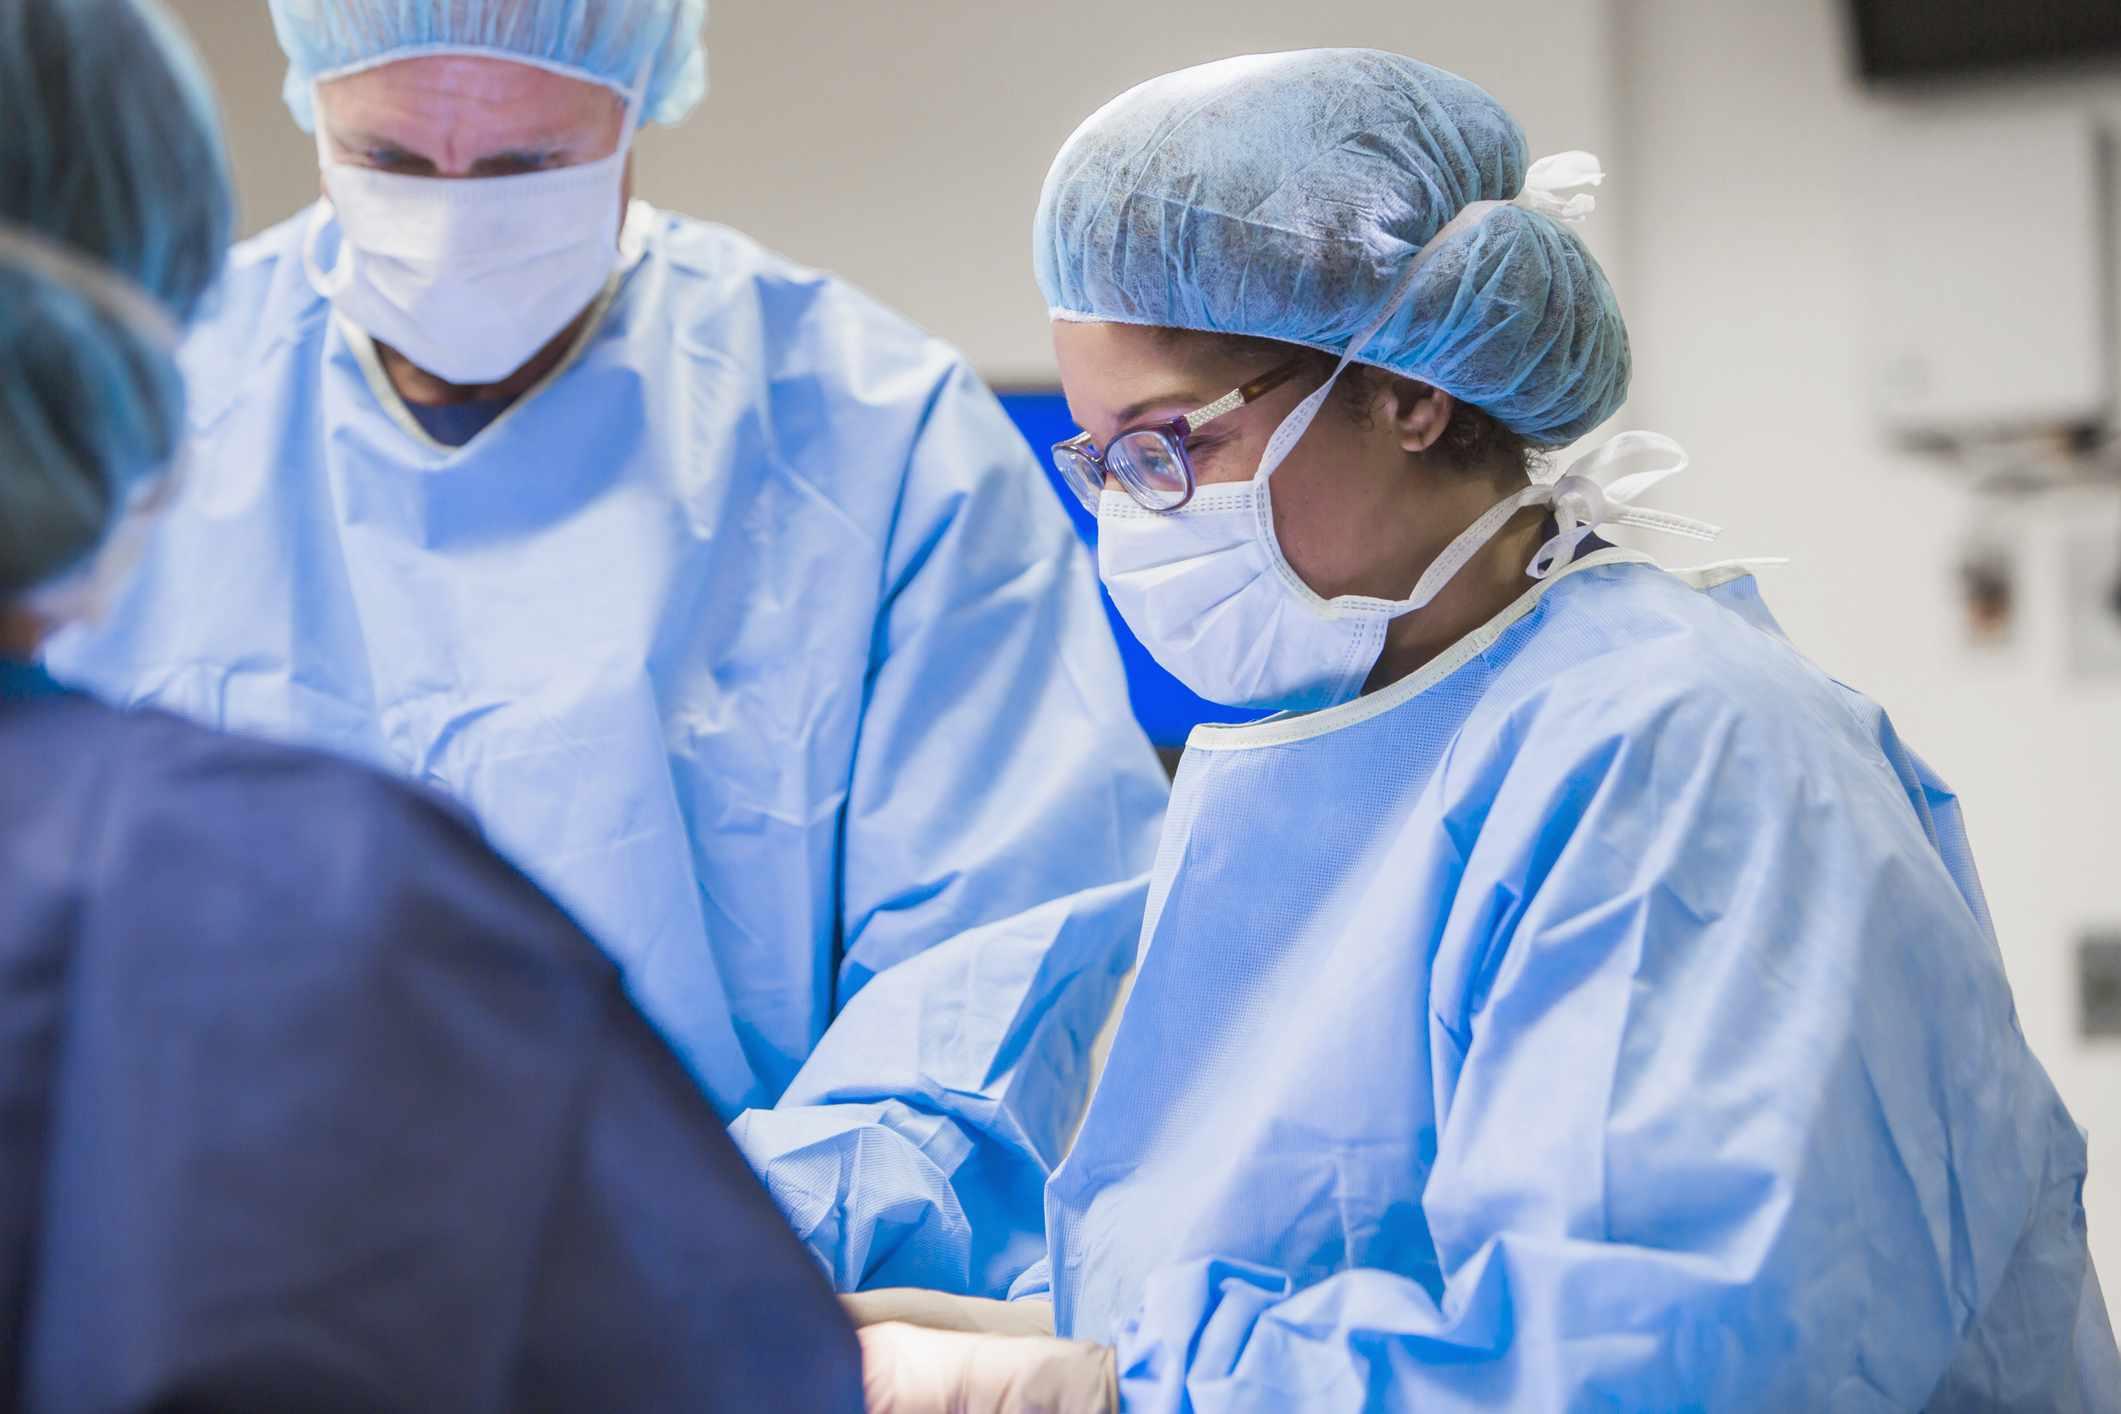 Surgeons perform Whipple procedure